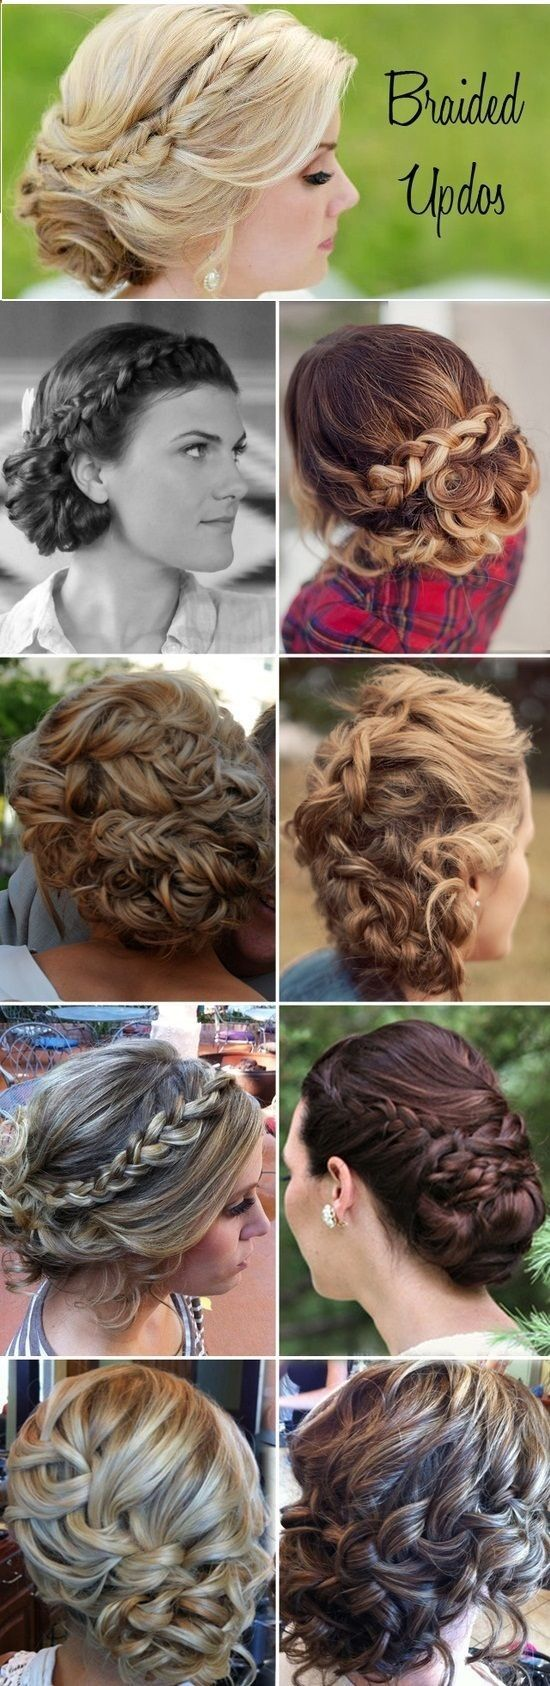 Updo Hairstyles using braids